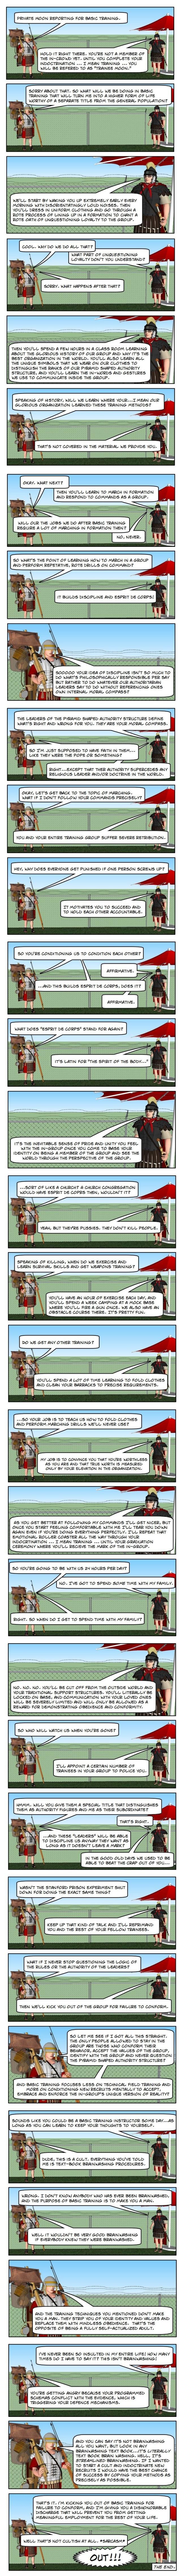 (Comic) How Basic Training Works